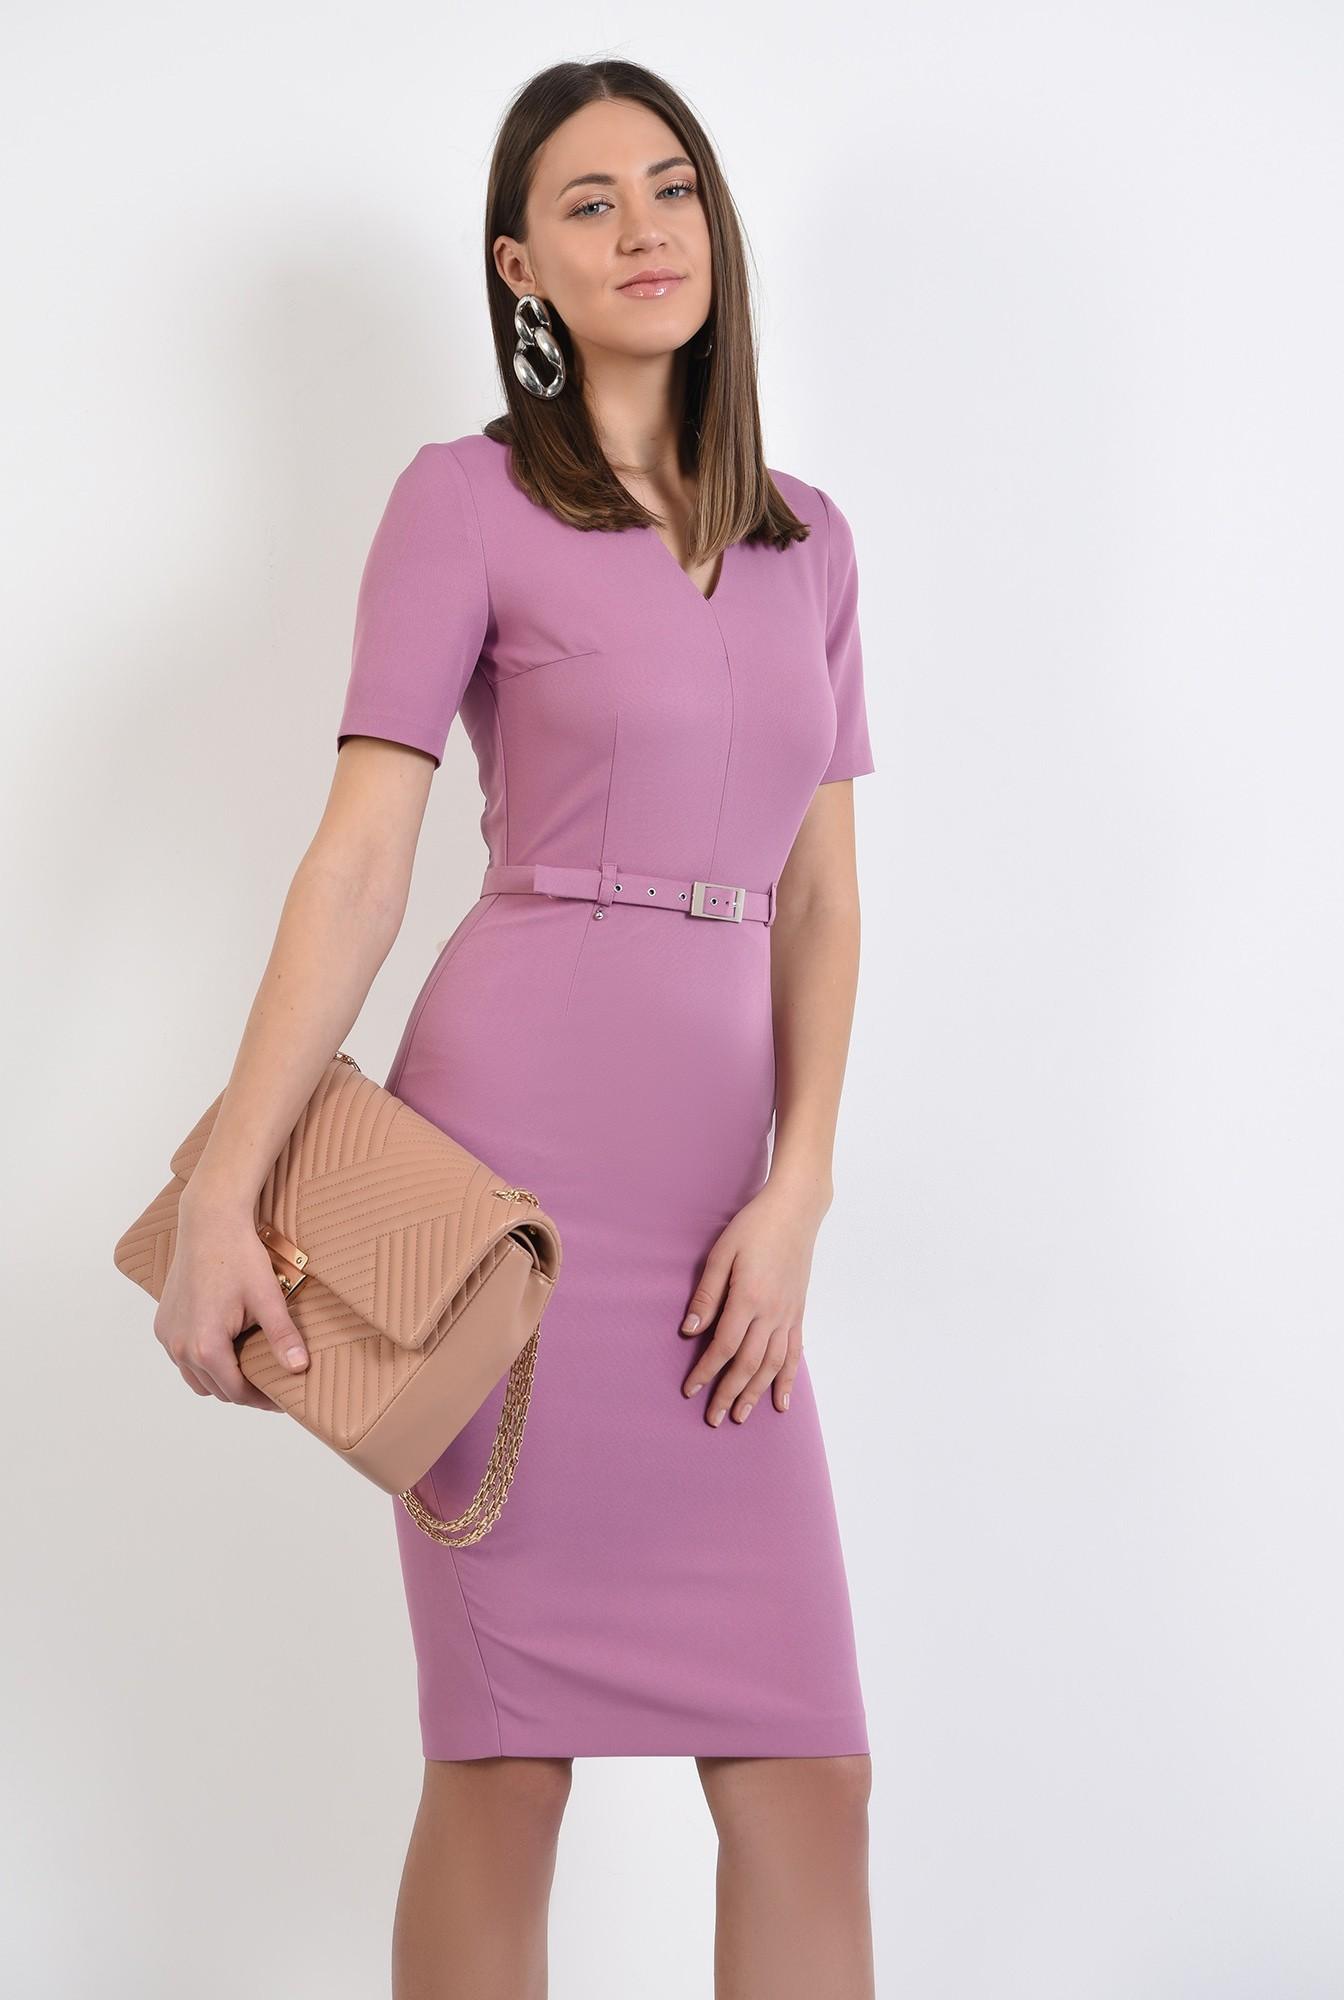 rochie midi, cambrata, cu curea fina, maneci scurte, rochie office, rochie de primavara